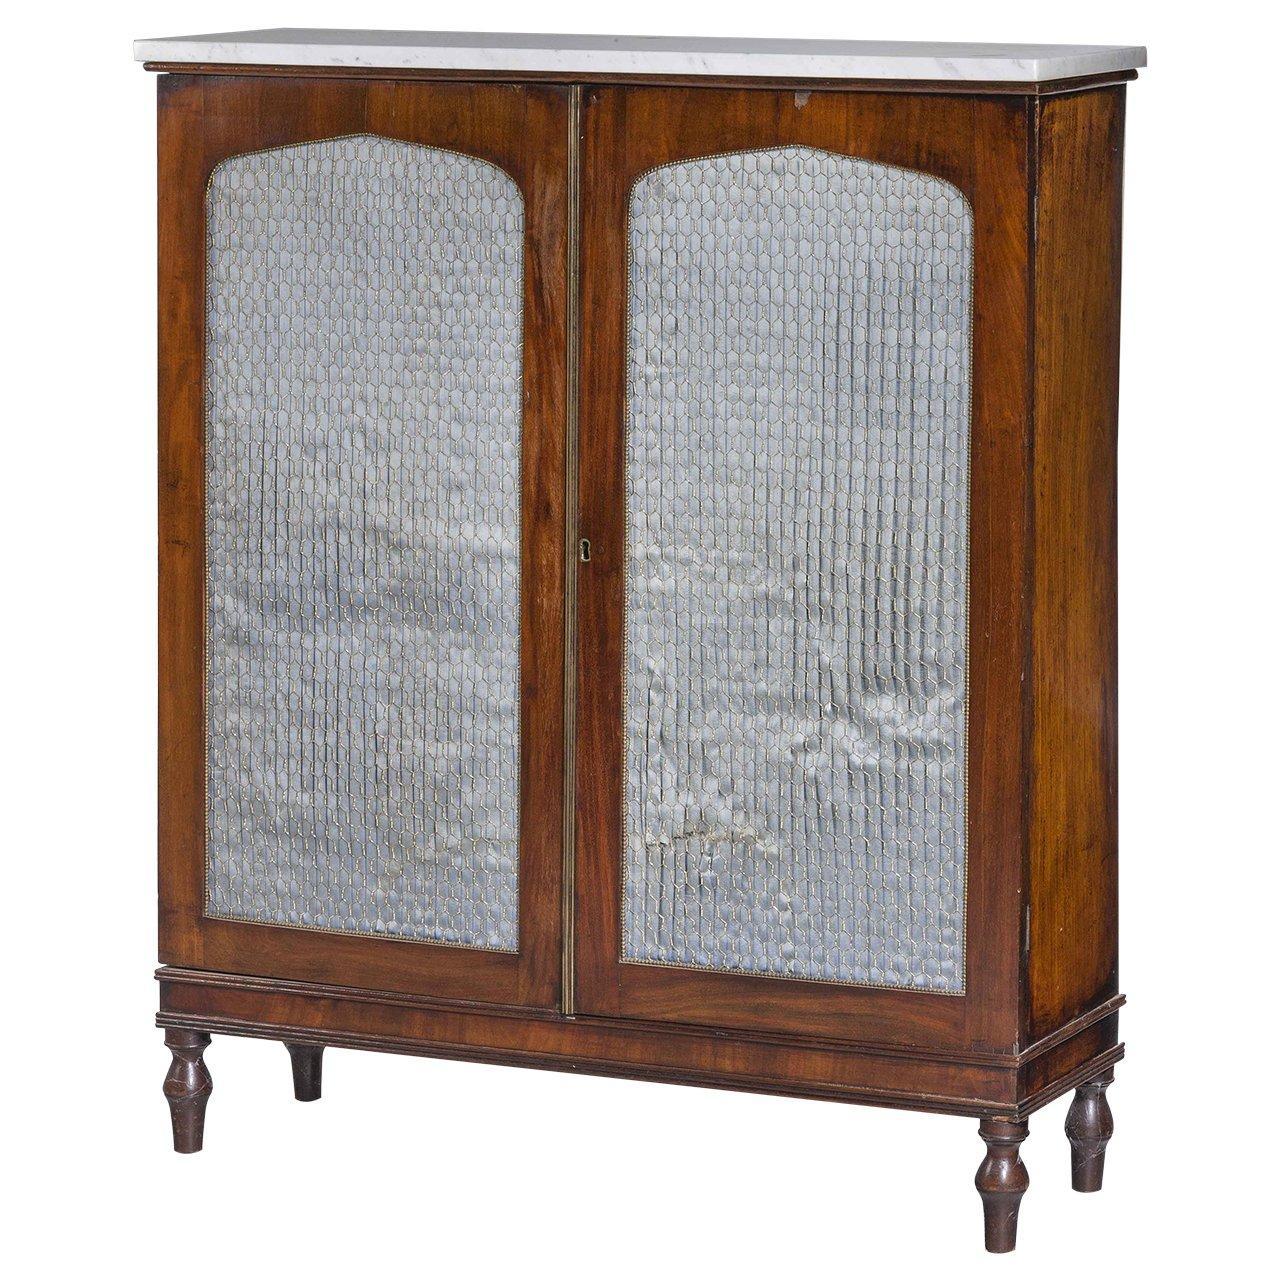 Regency Period Mahogany Side Cabinet